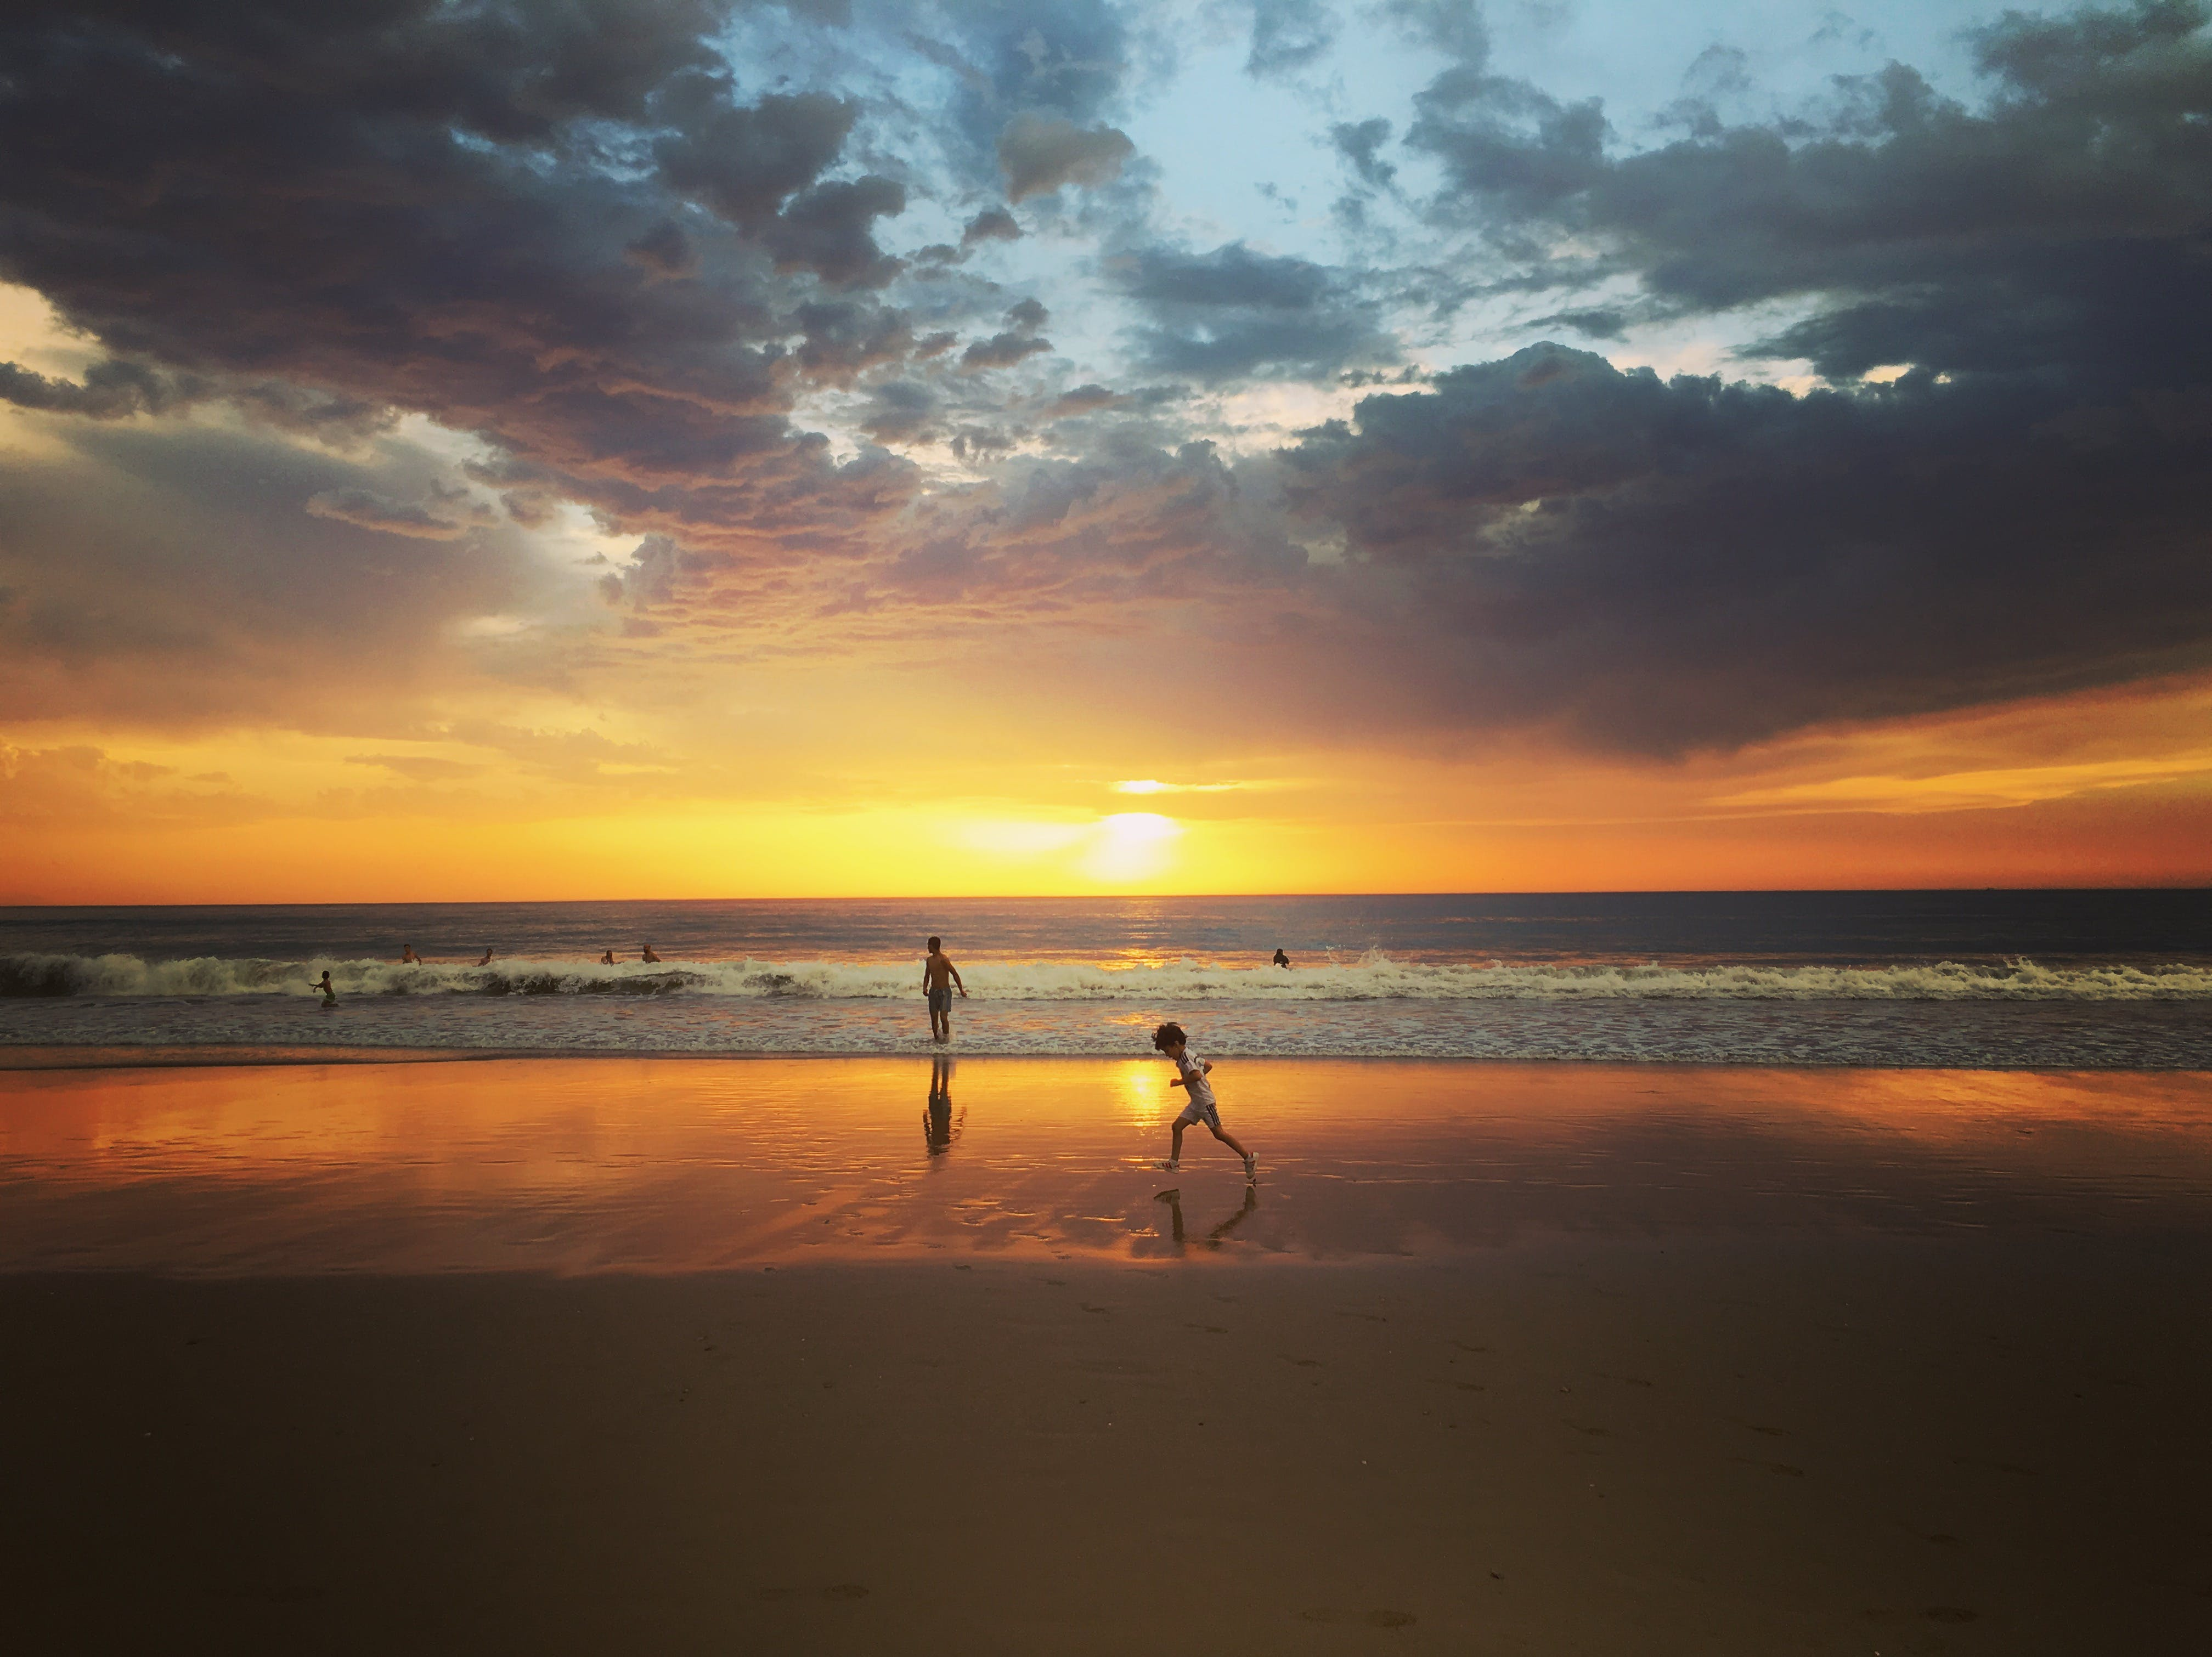 Child Standing on Seashore